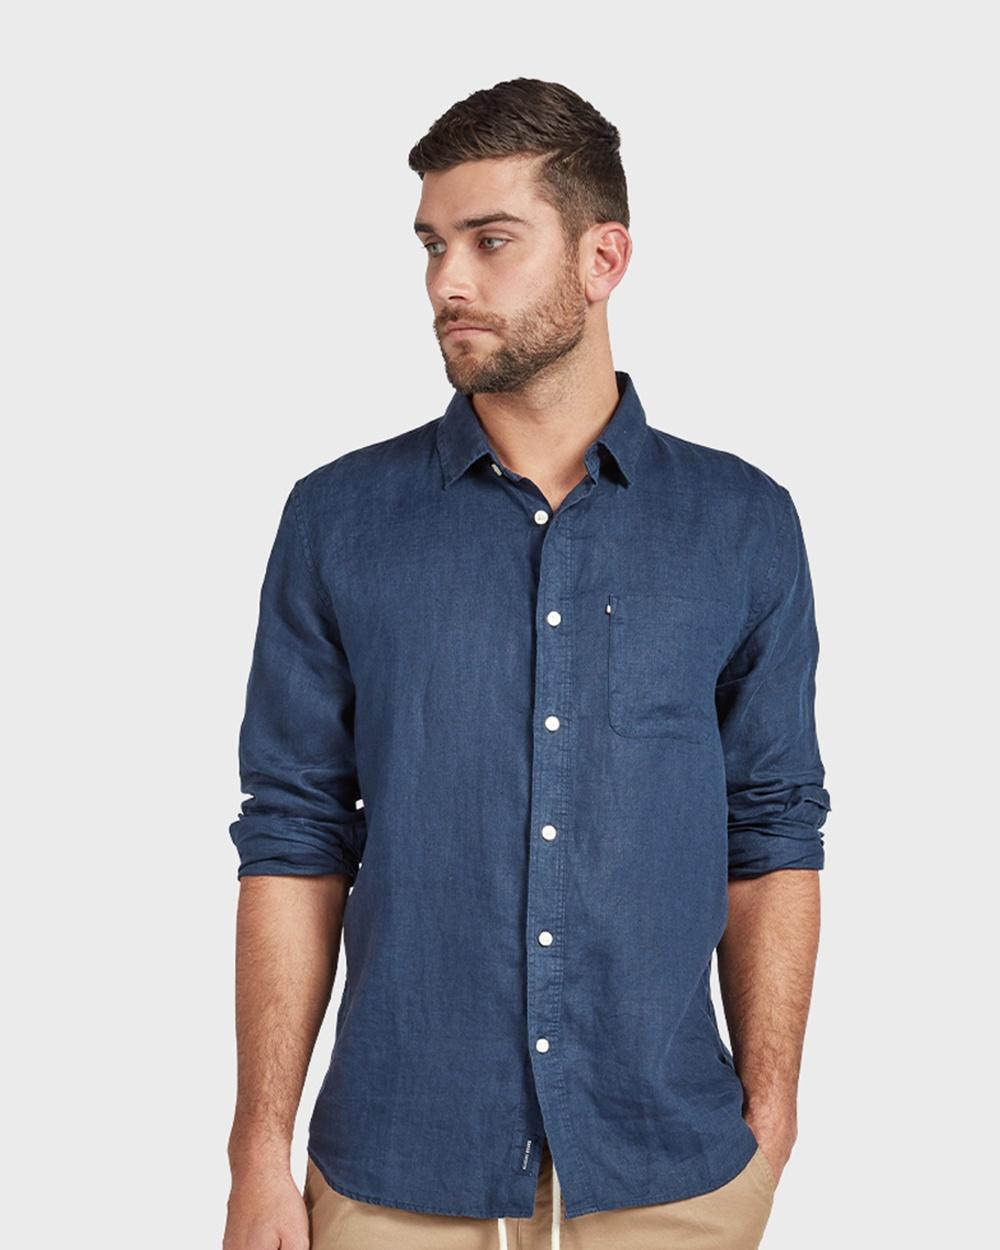 Academy Brand Hampton L S Linen Shirt Shirts & Polos Navy L-S